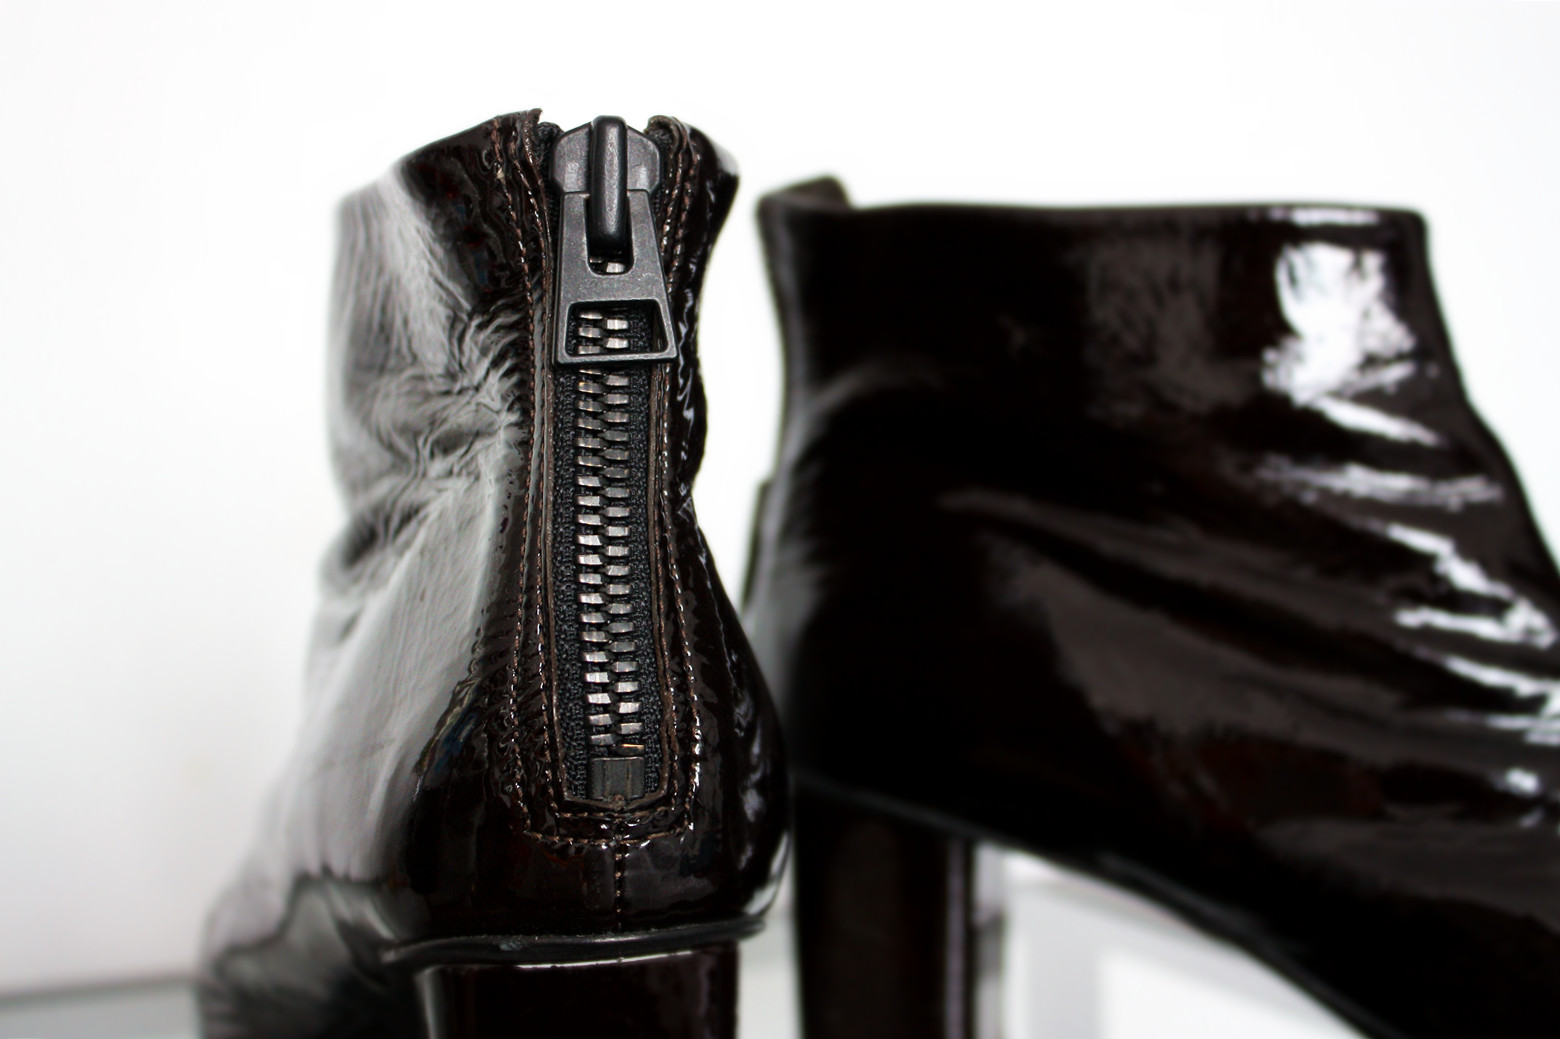 botki H&M, skórzane botki, lakierowane botki, buty na obcasie H&M